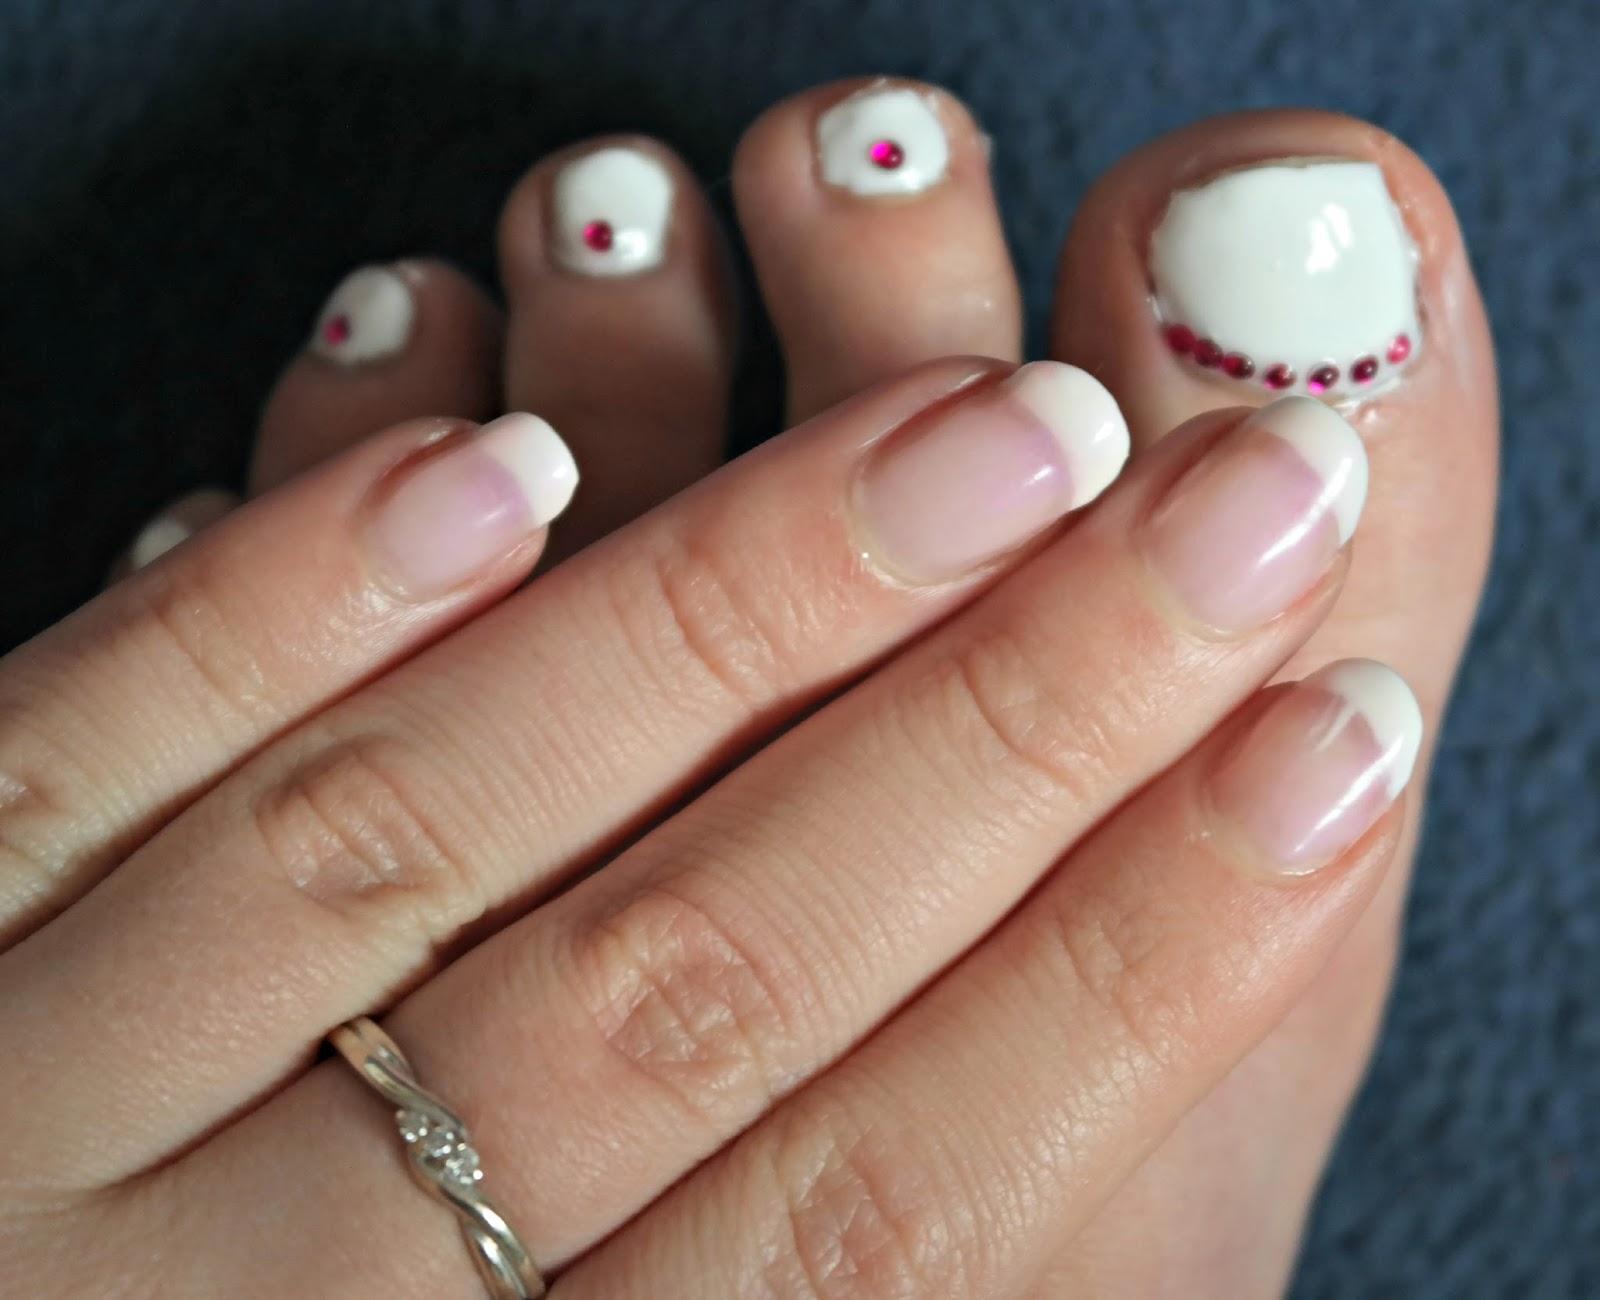 NOTD: Holidays Nails - Jenna Suth